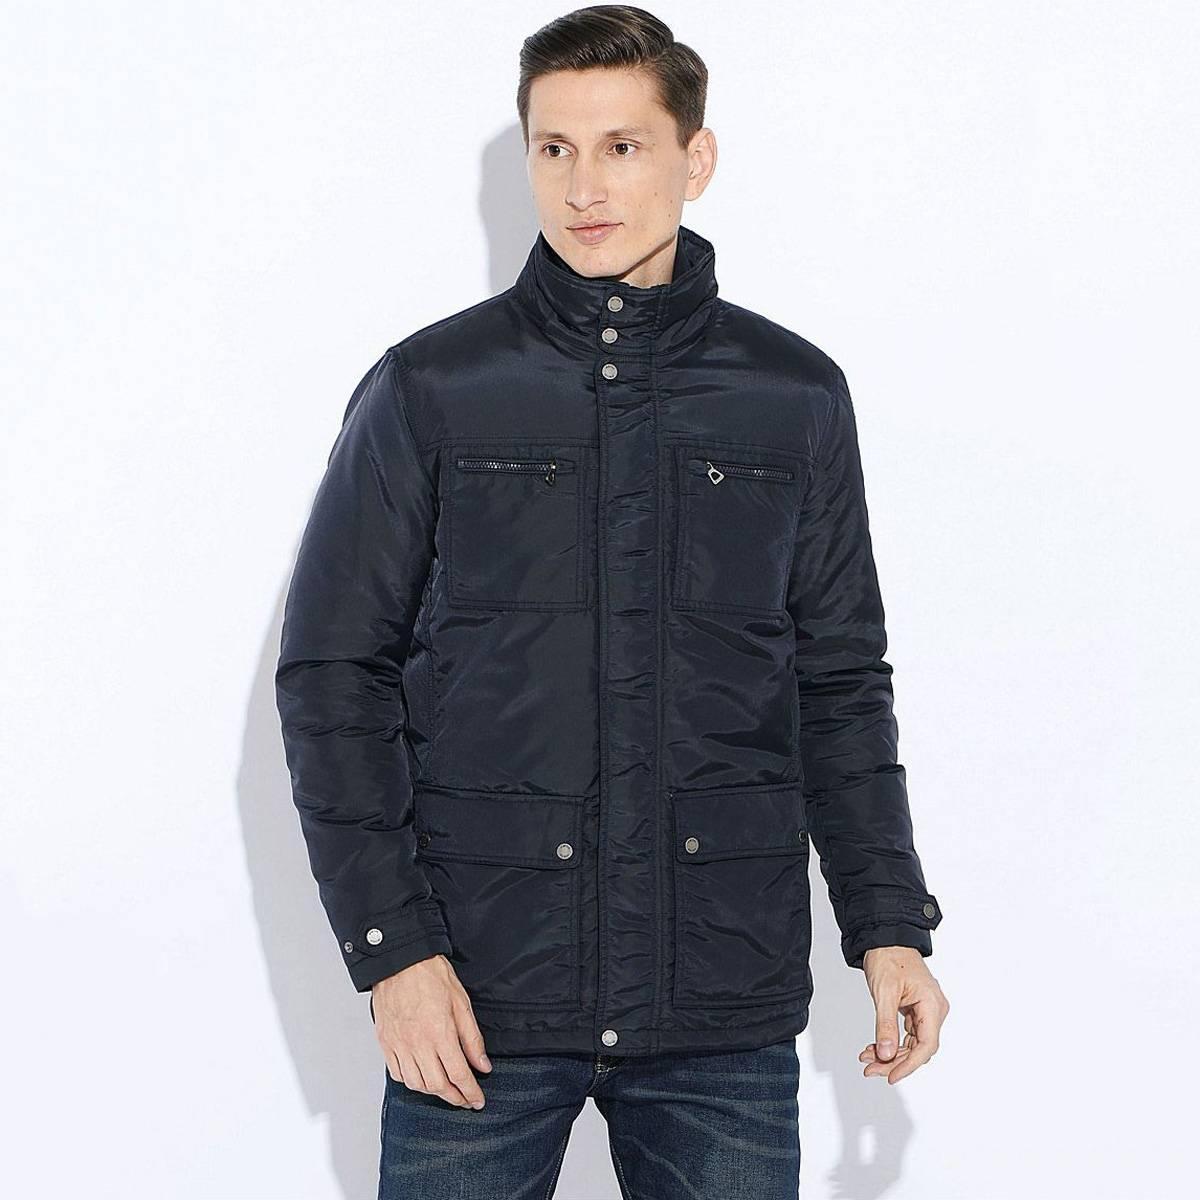 Демисезонная мужская куртка Geox M5420K DARK NAVY